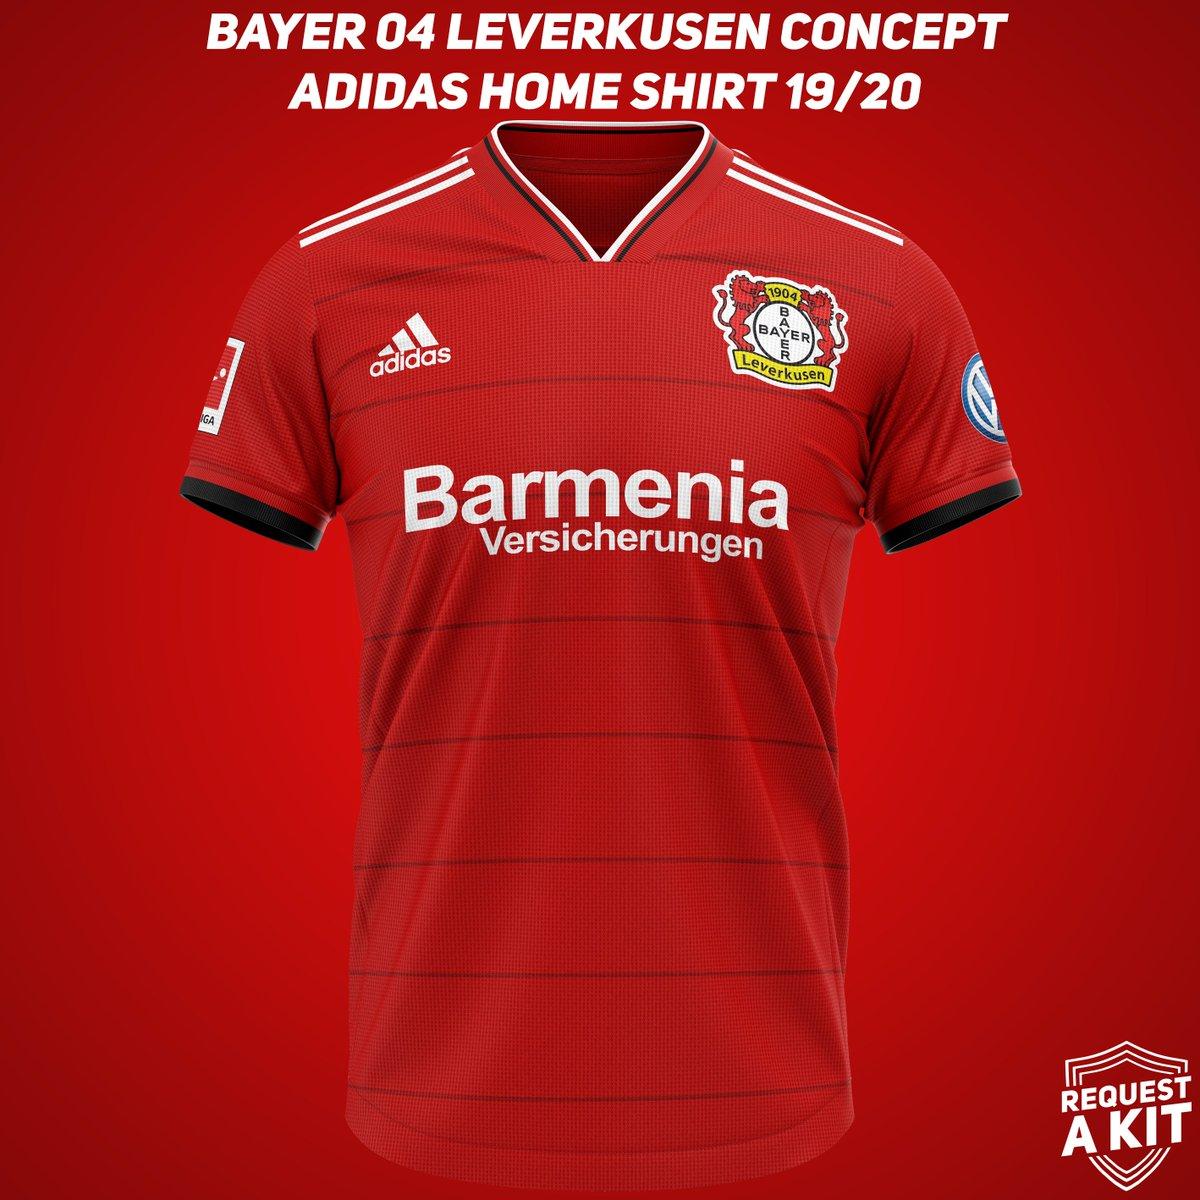 Bayer Leverkusen Jersey History